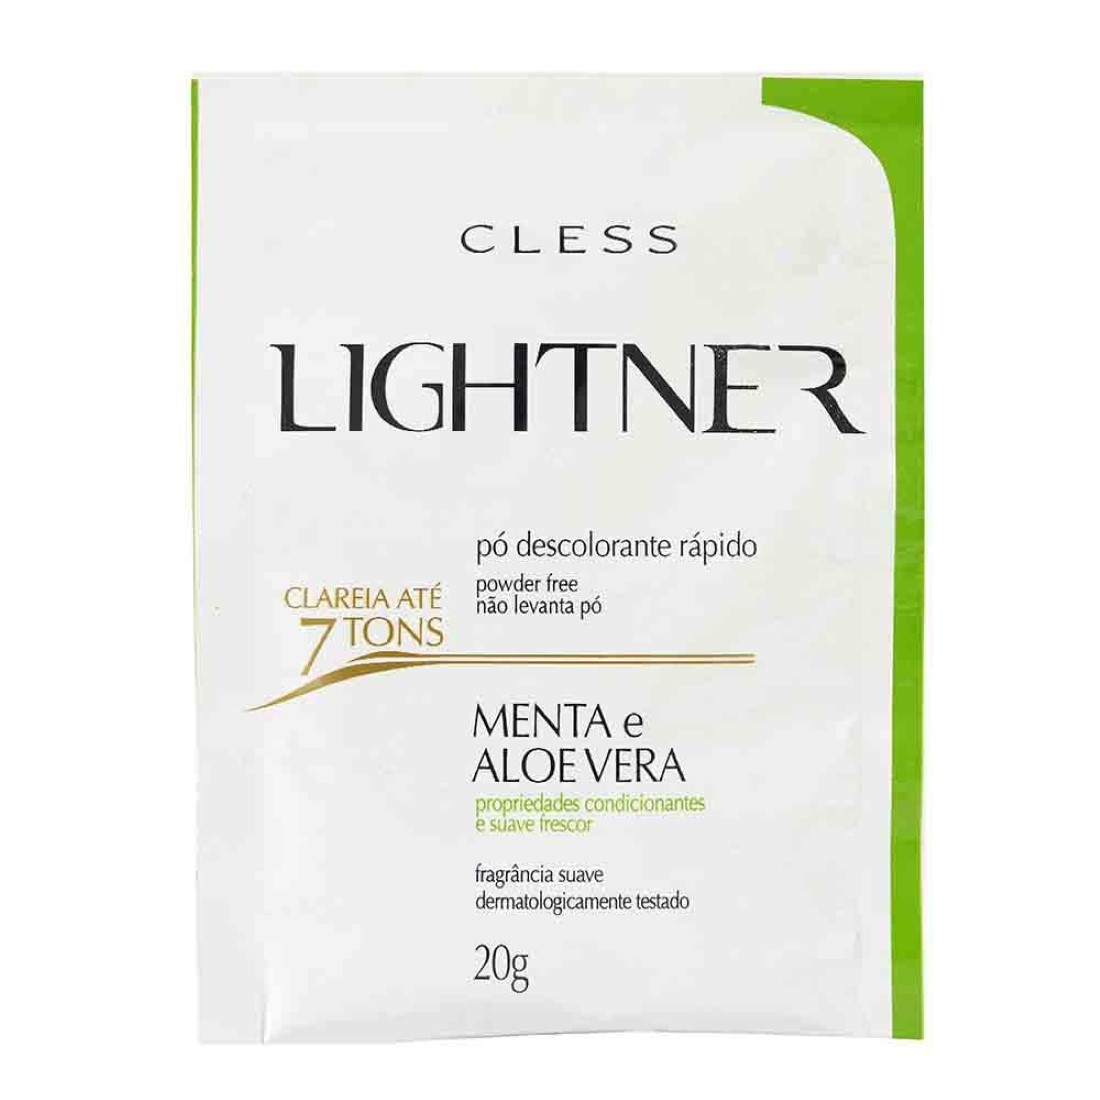 Pó Descolorante Lightner Menta 20g - Cless